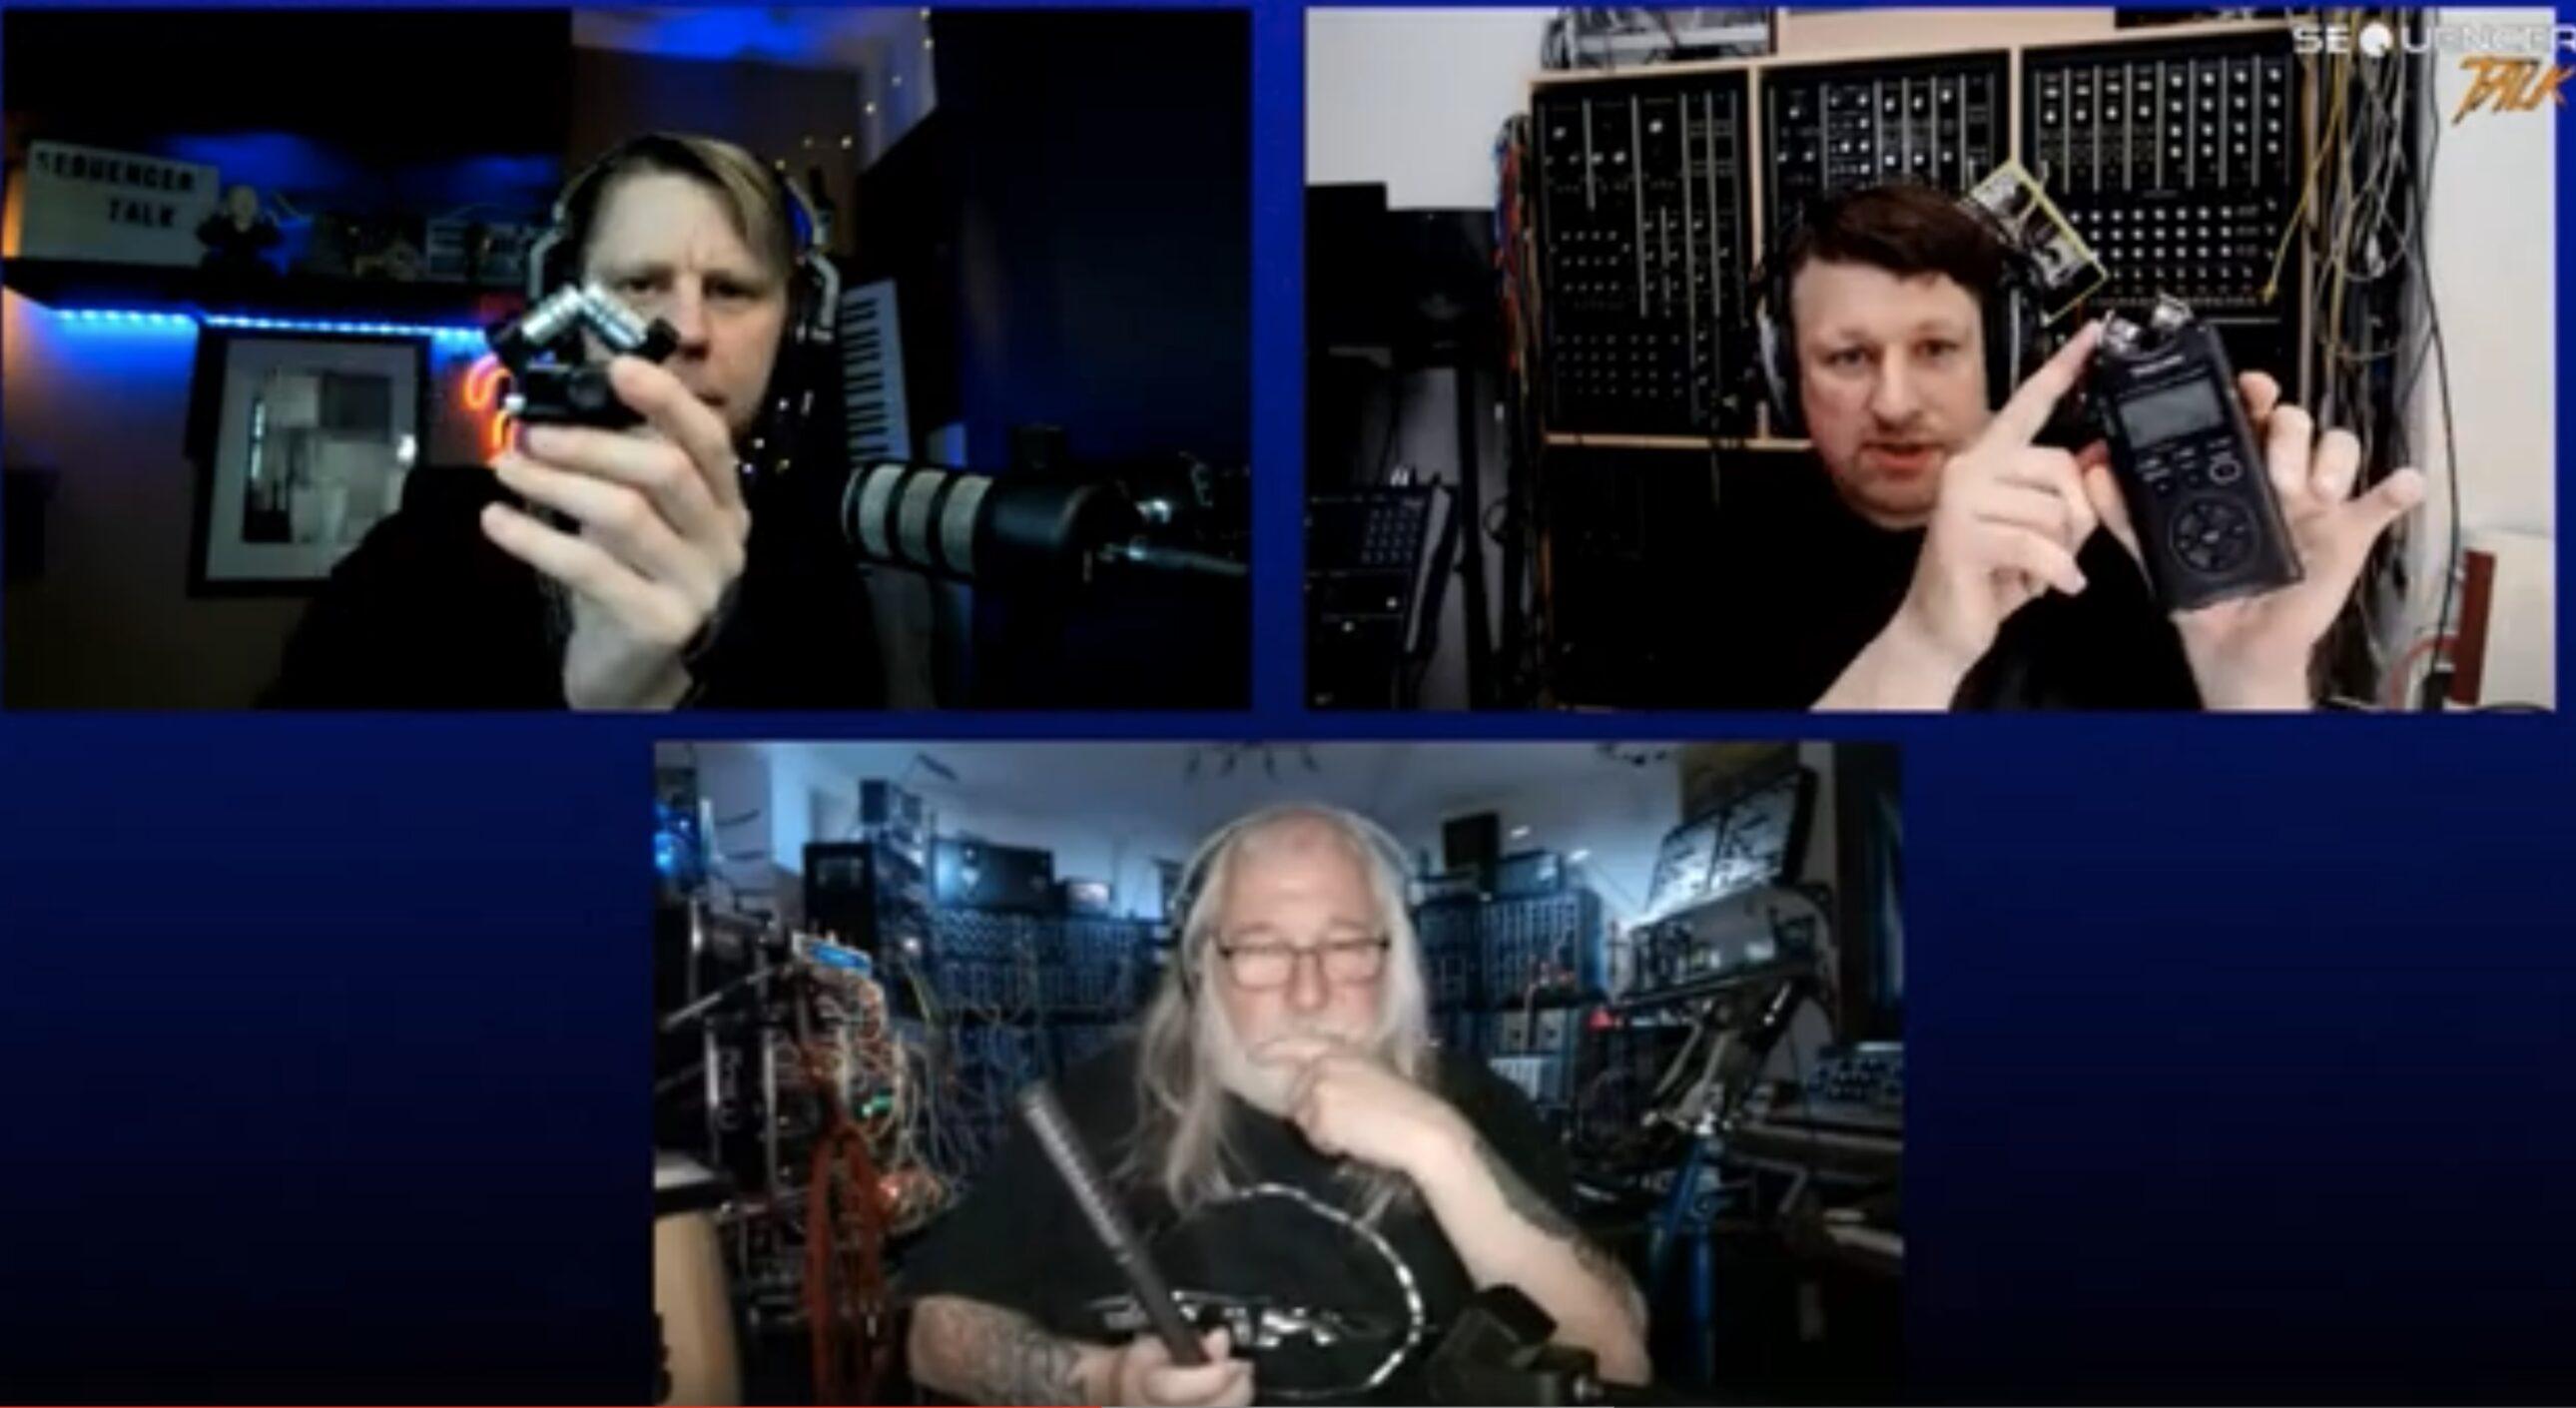 SequencerTalk 92 Field Recording